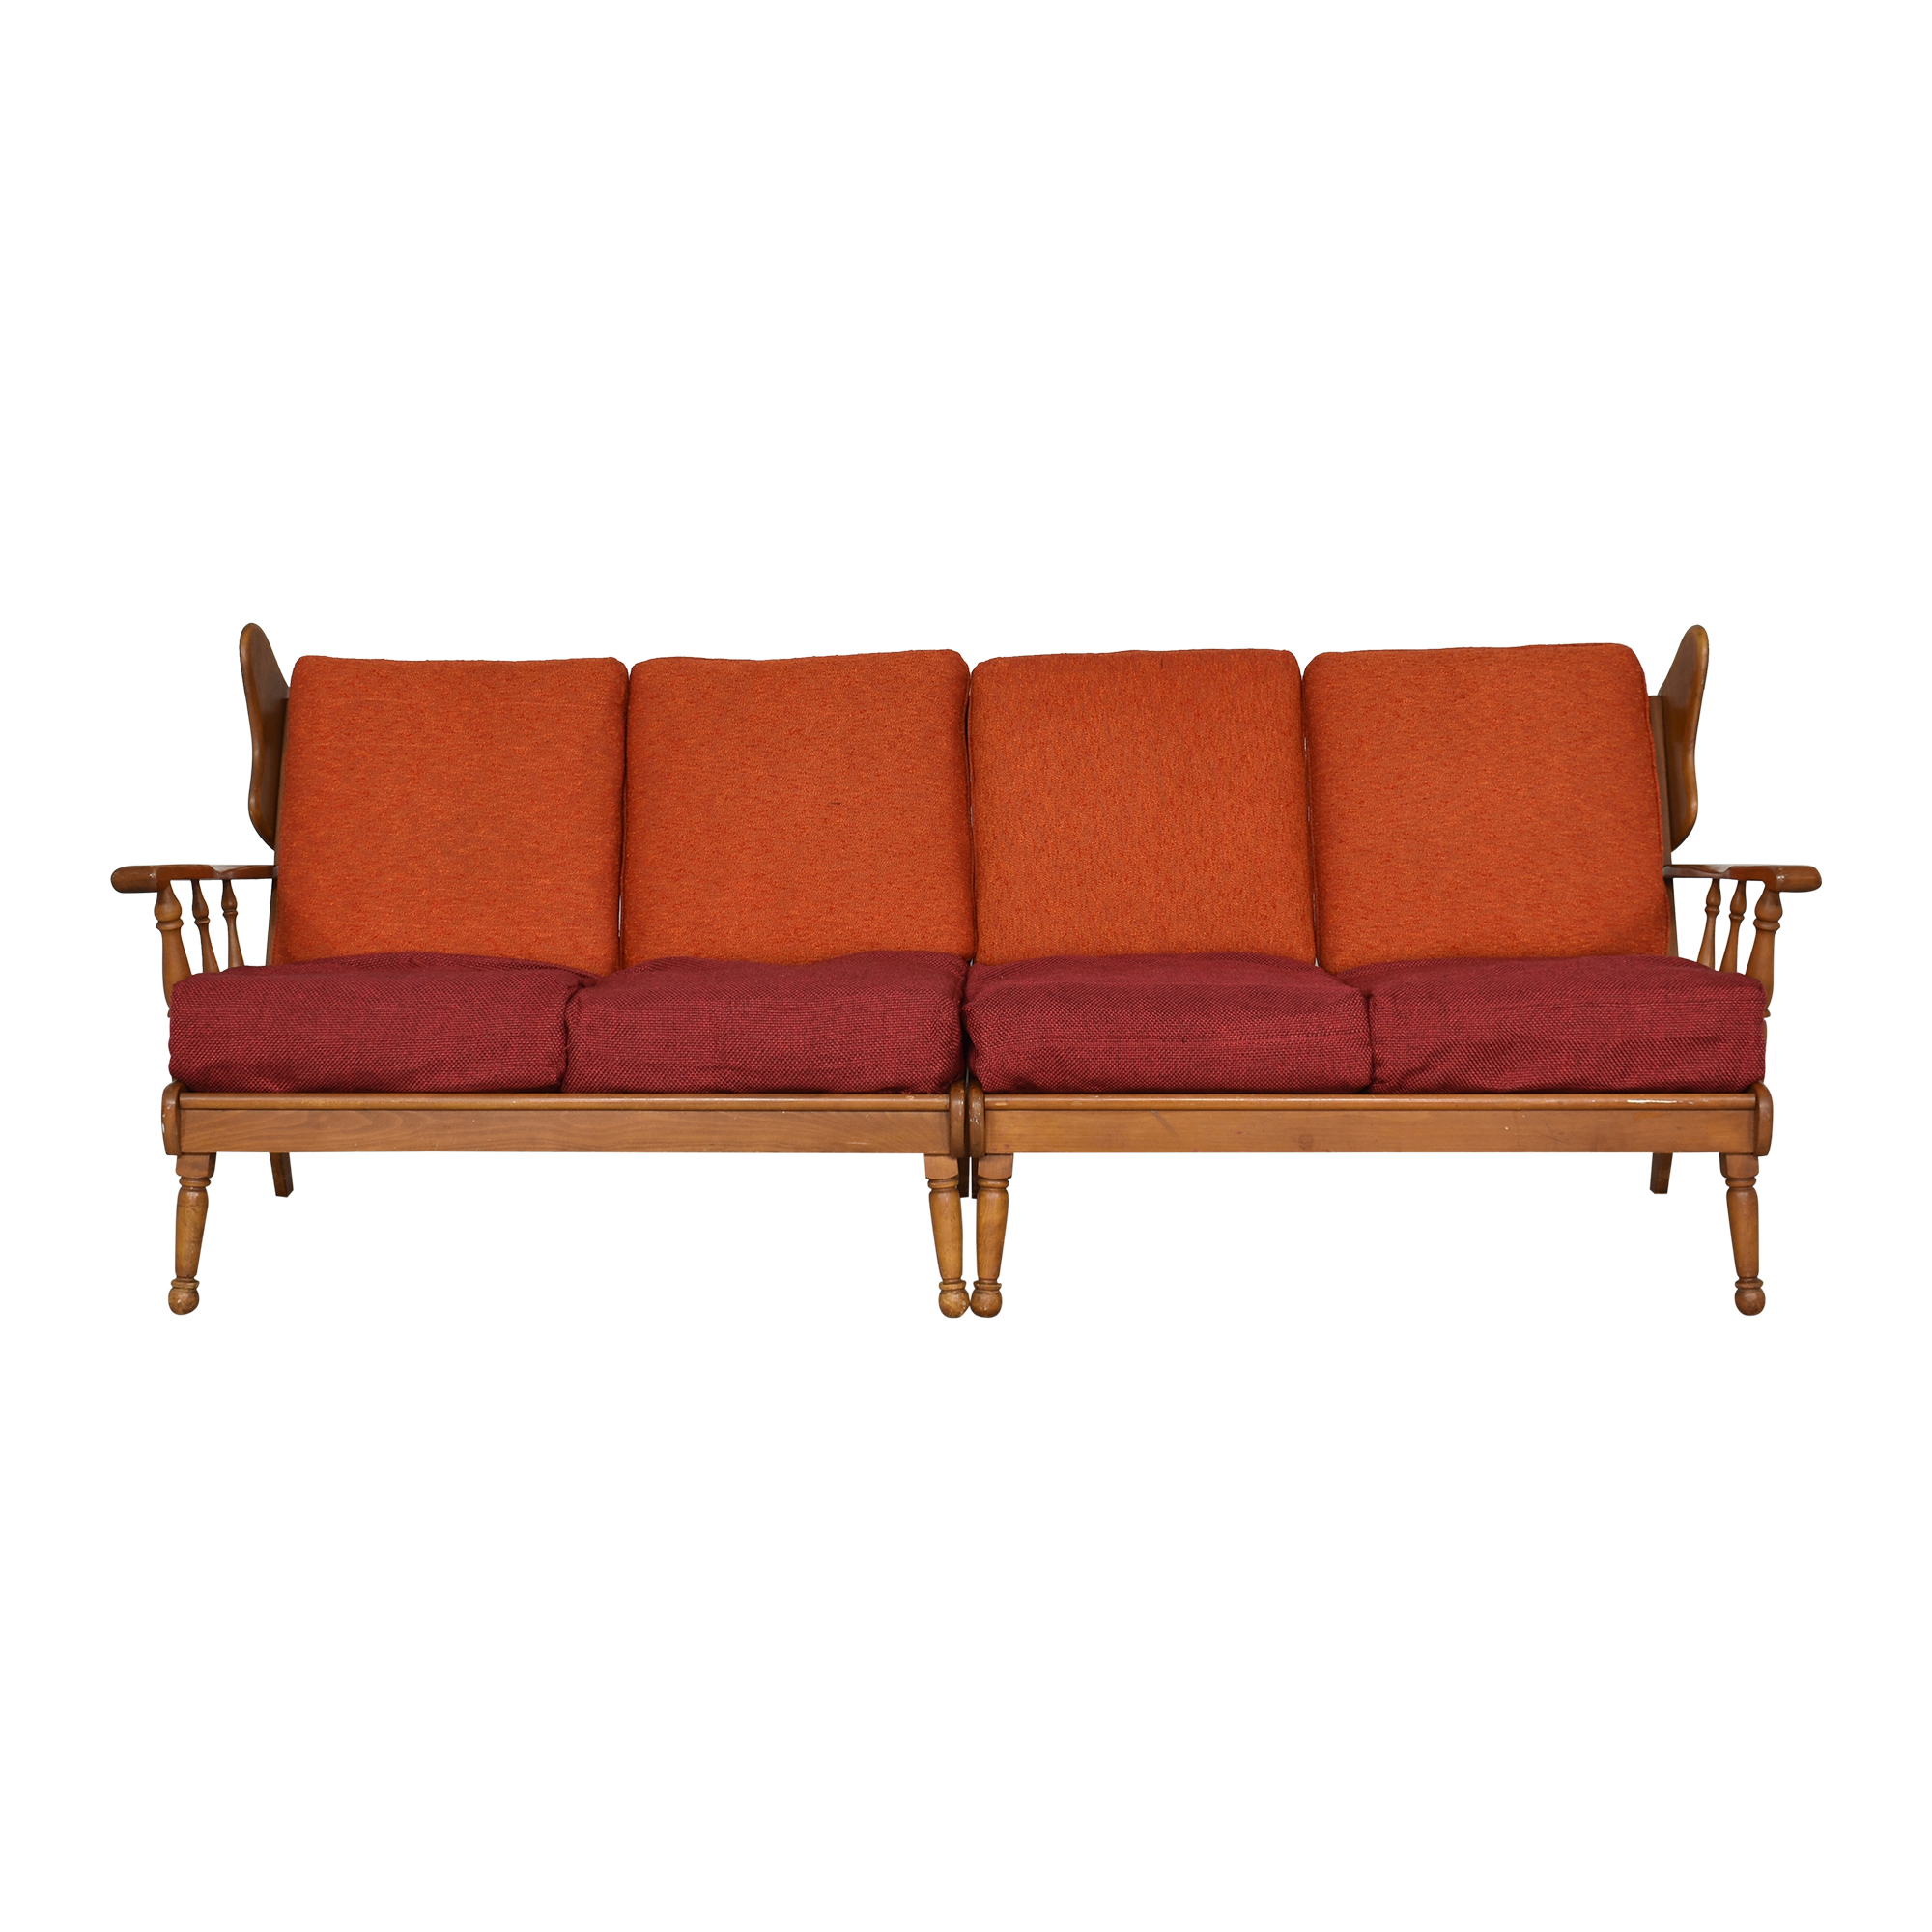 Ethan Allen Vintage-Style Four Cushion Sofa / Classic Sofas